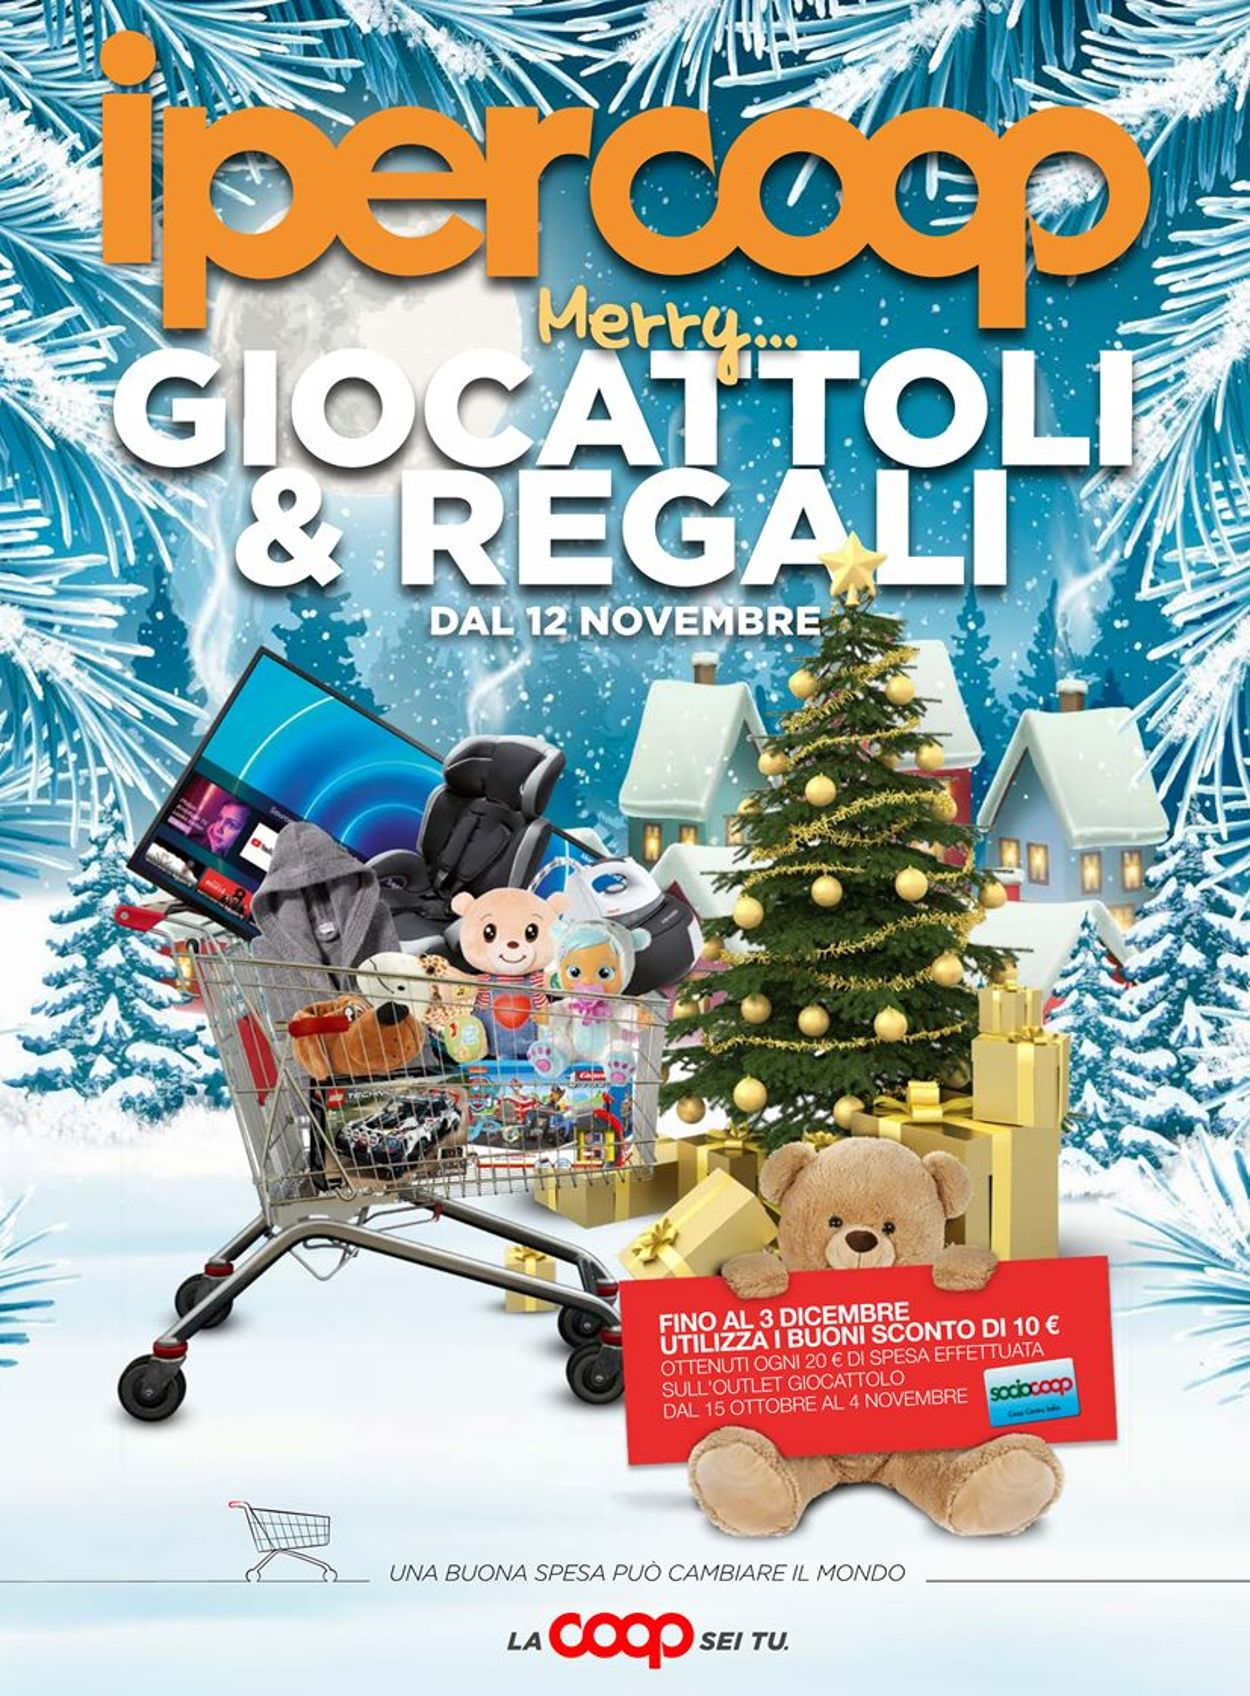 Volantino Coop - Natale 2020 - Offerte 12/11-22/11/2020